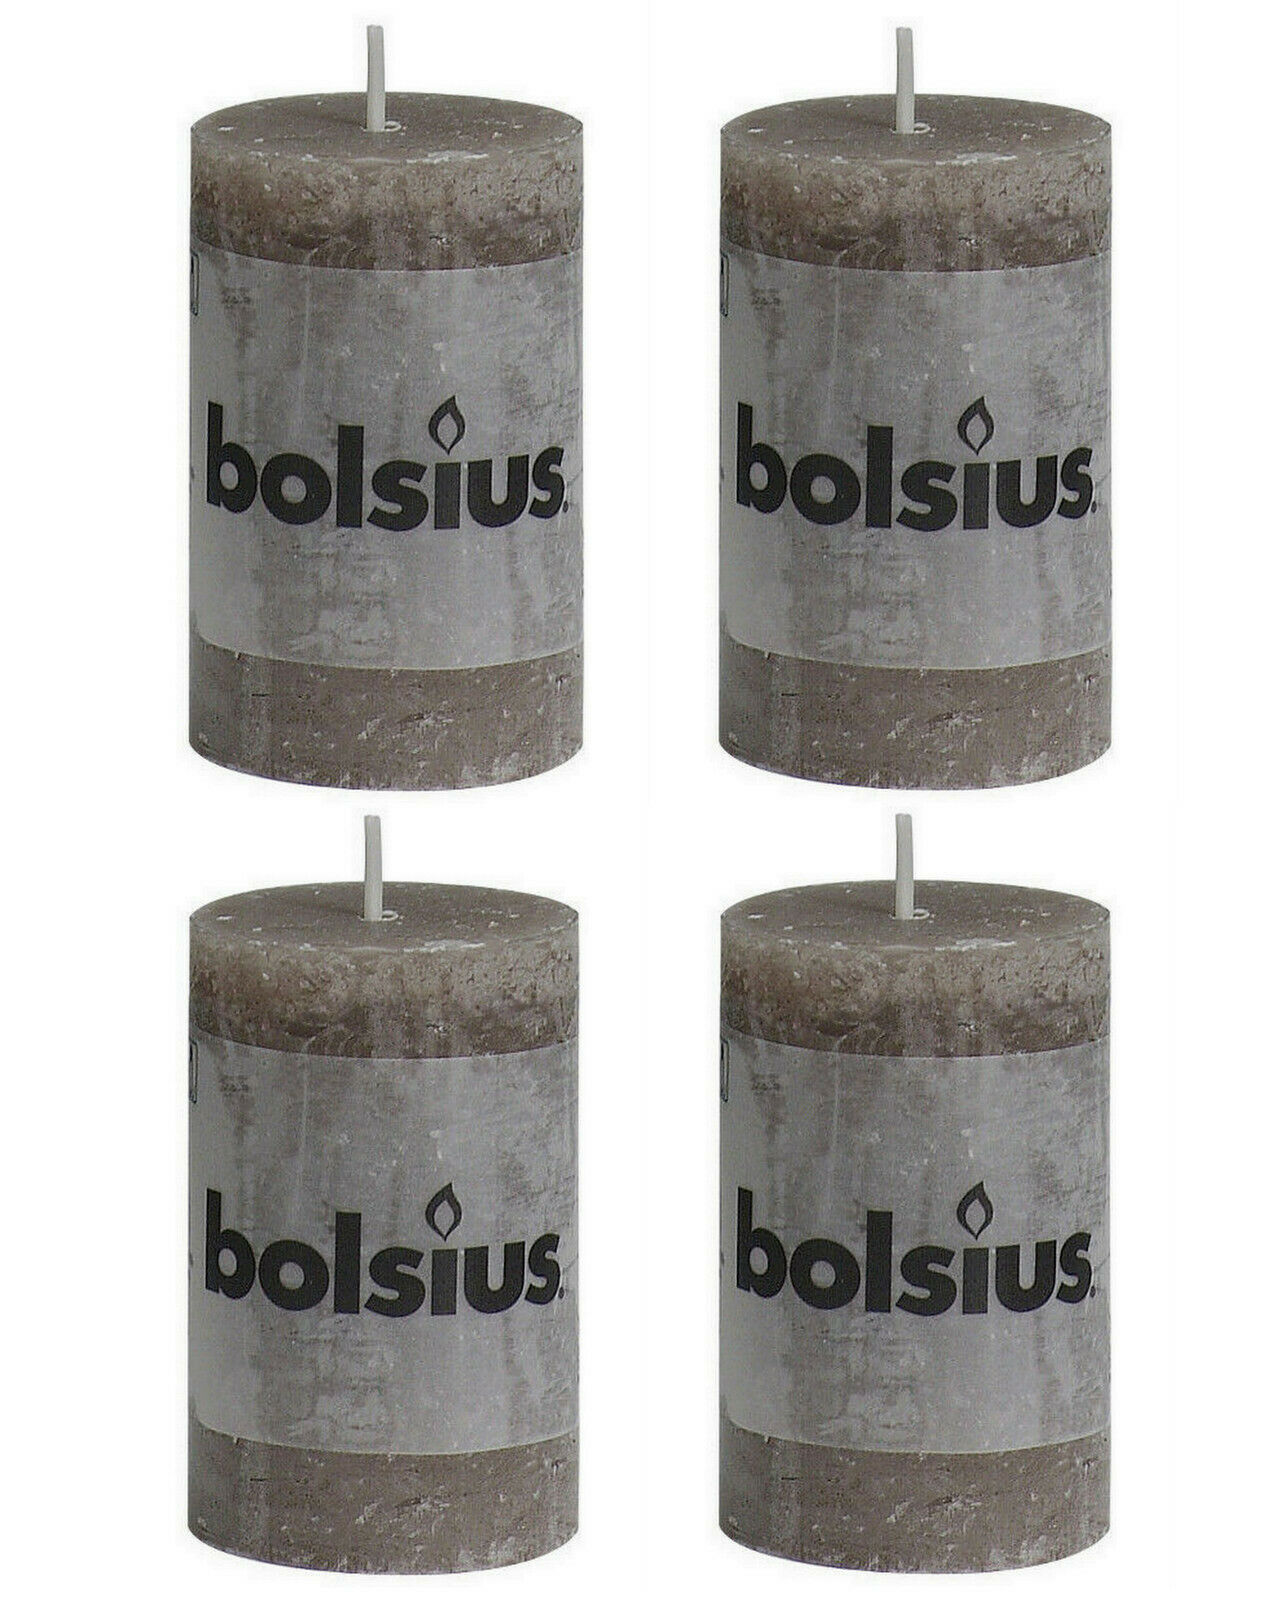 8 Stück Bolsius Rustic Stumpenkerzen 80x50 mm Qualitäts-Kerzen Candle  - Taupe